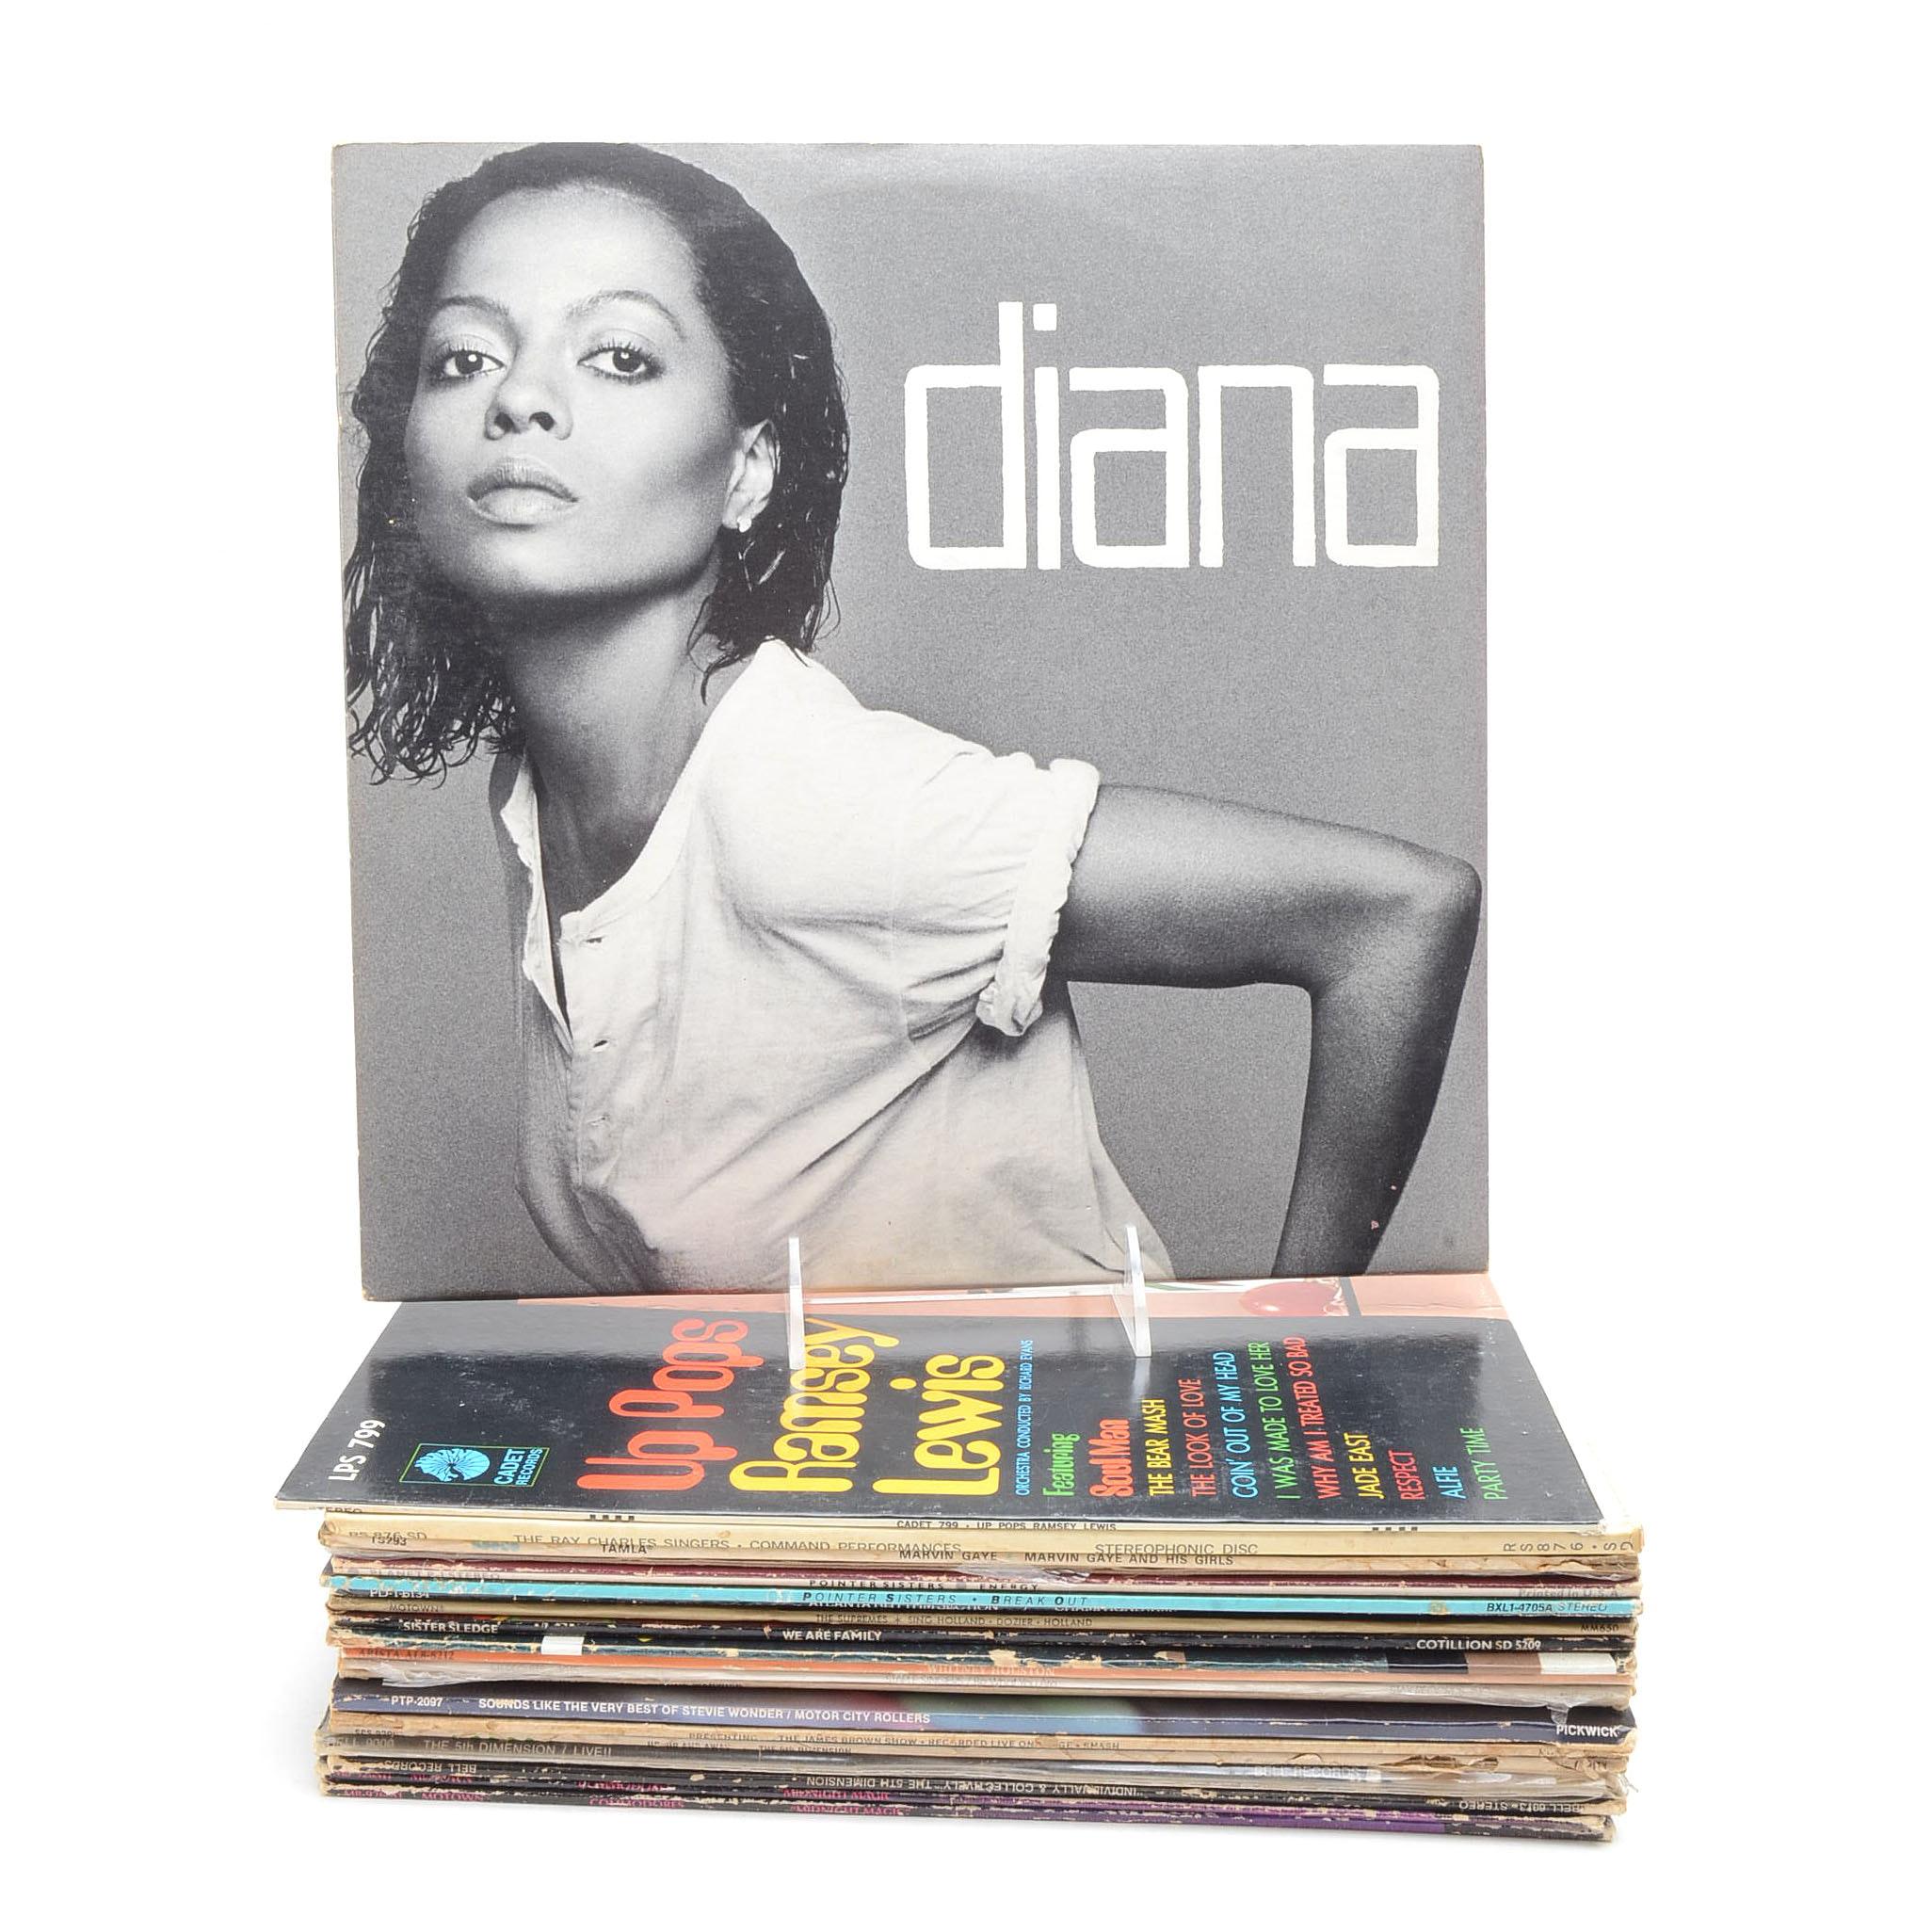 Soul and R&B Vinyl